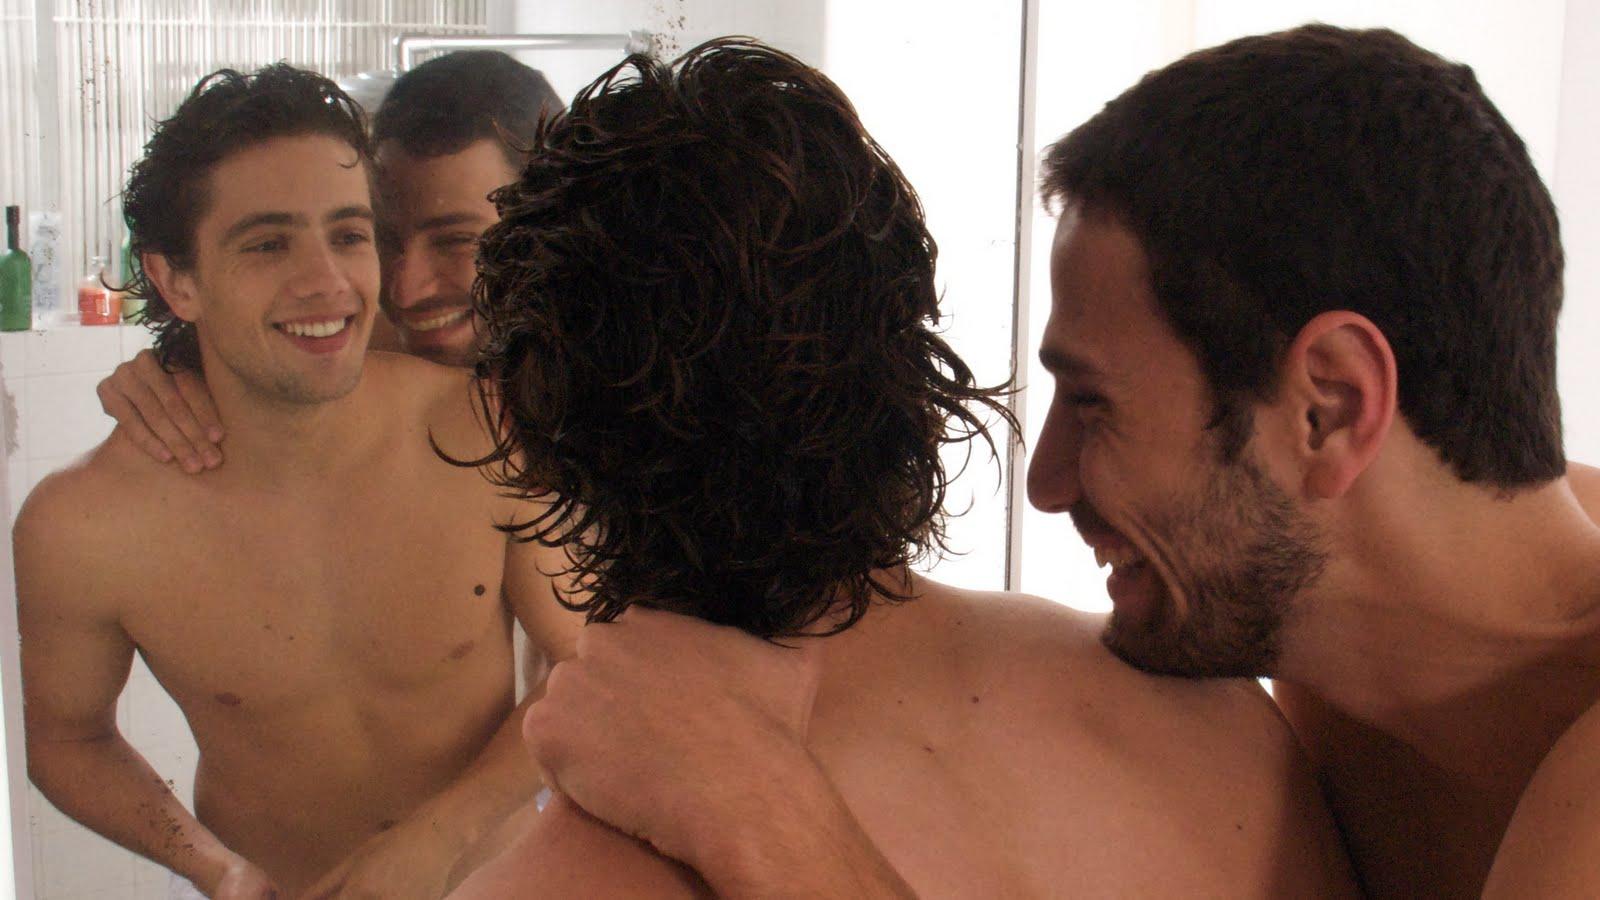 hot gay movie: